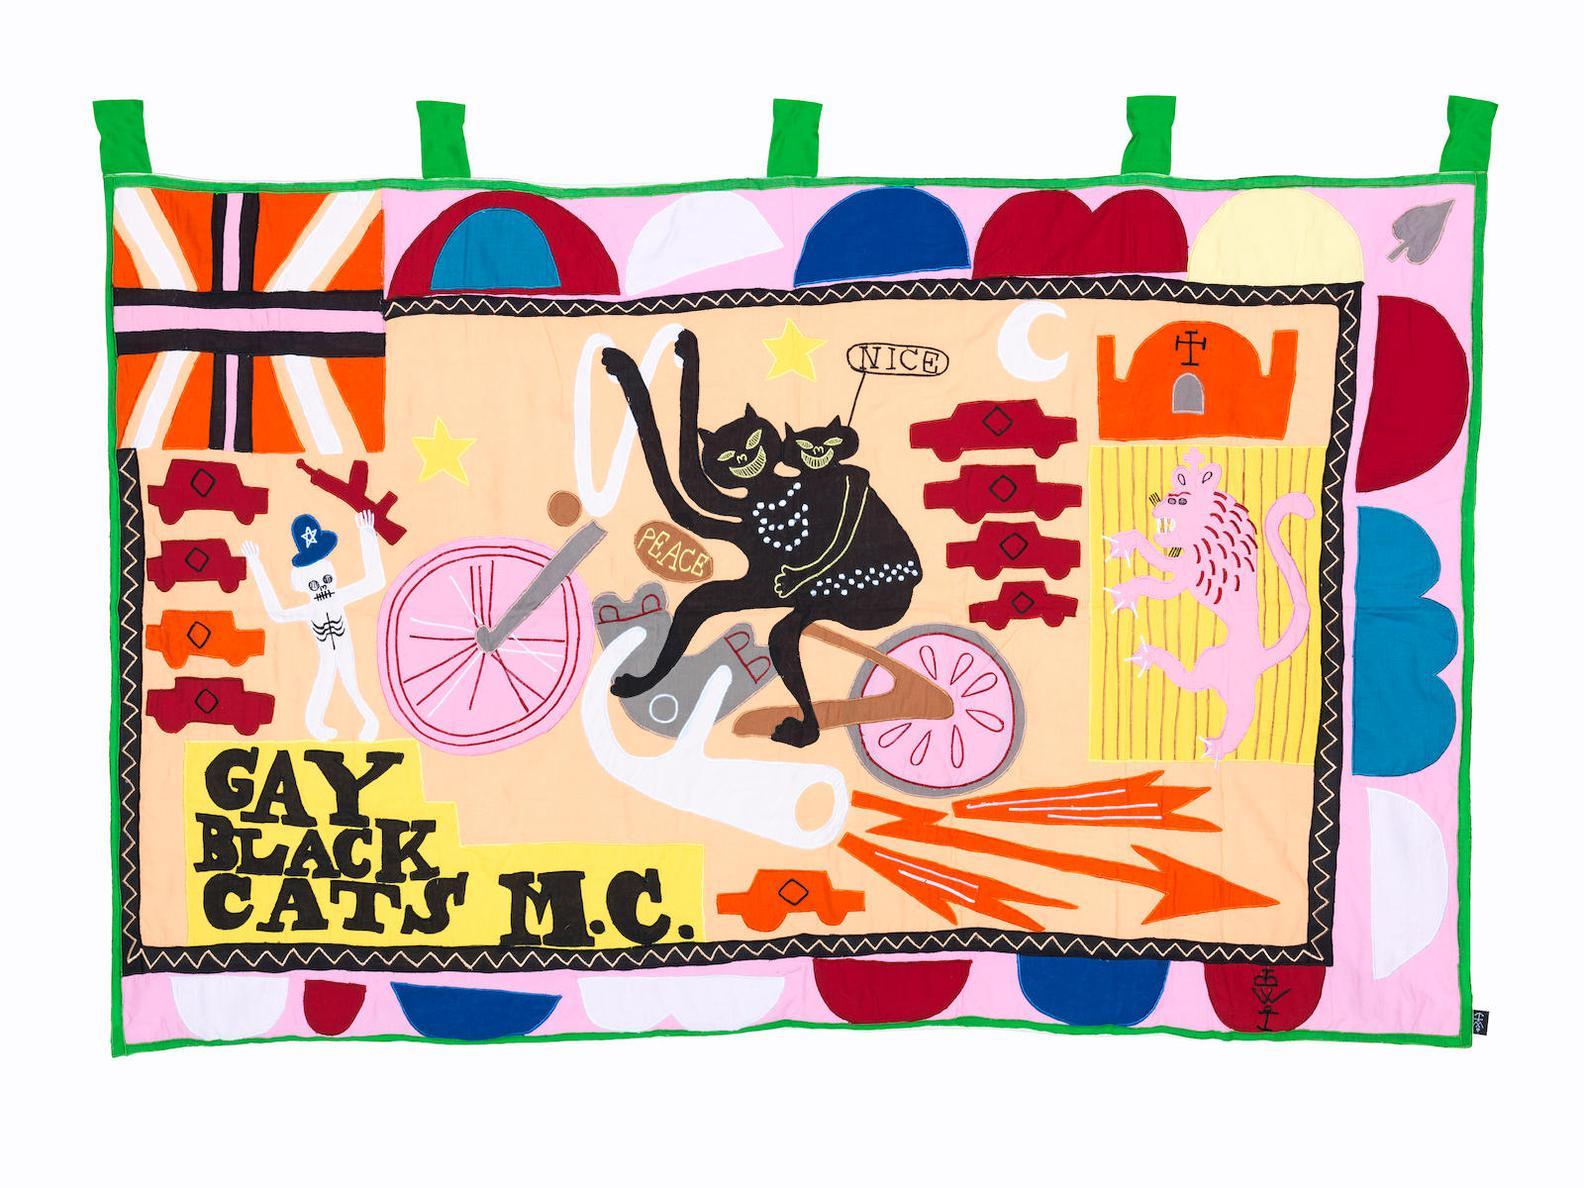 Grayson Perry-Gay Black Cats M.C.-2017